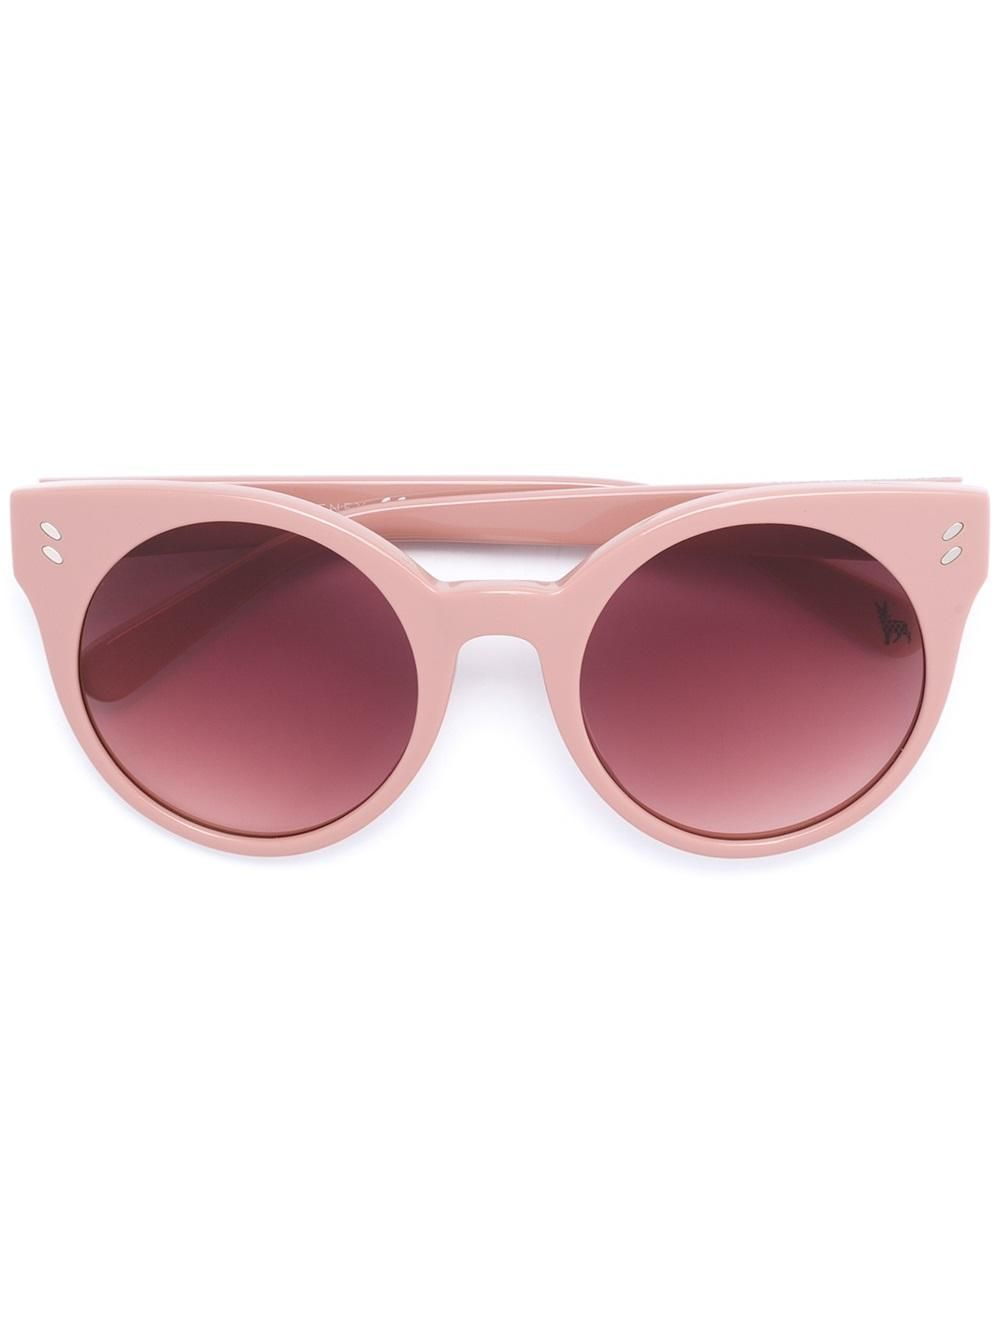 36f8c655806 Stella Mccartney Kids hard round frame sunglasses